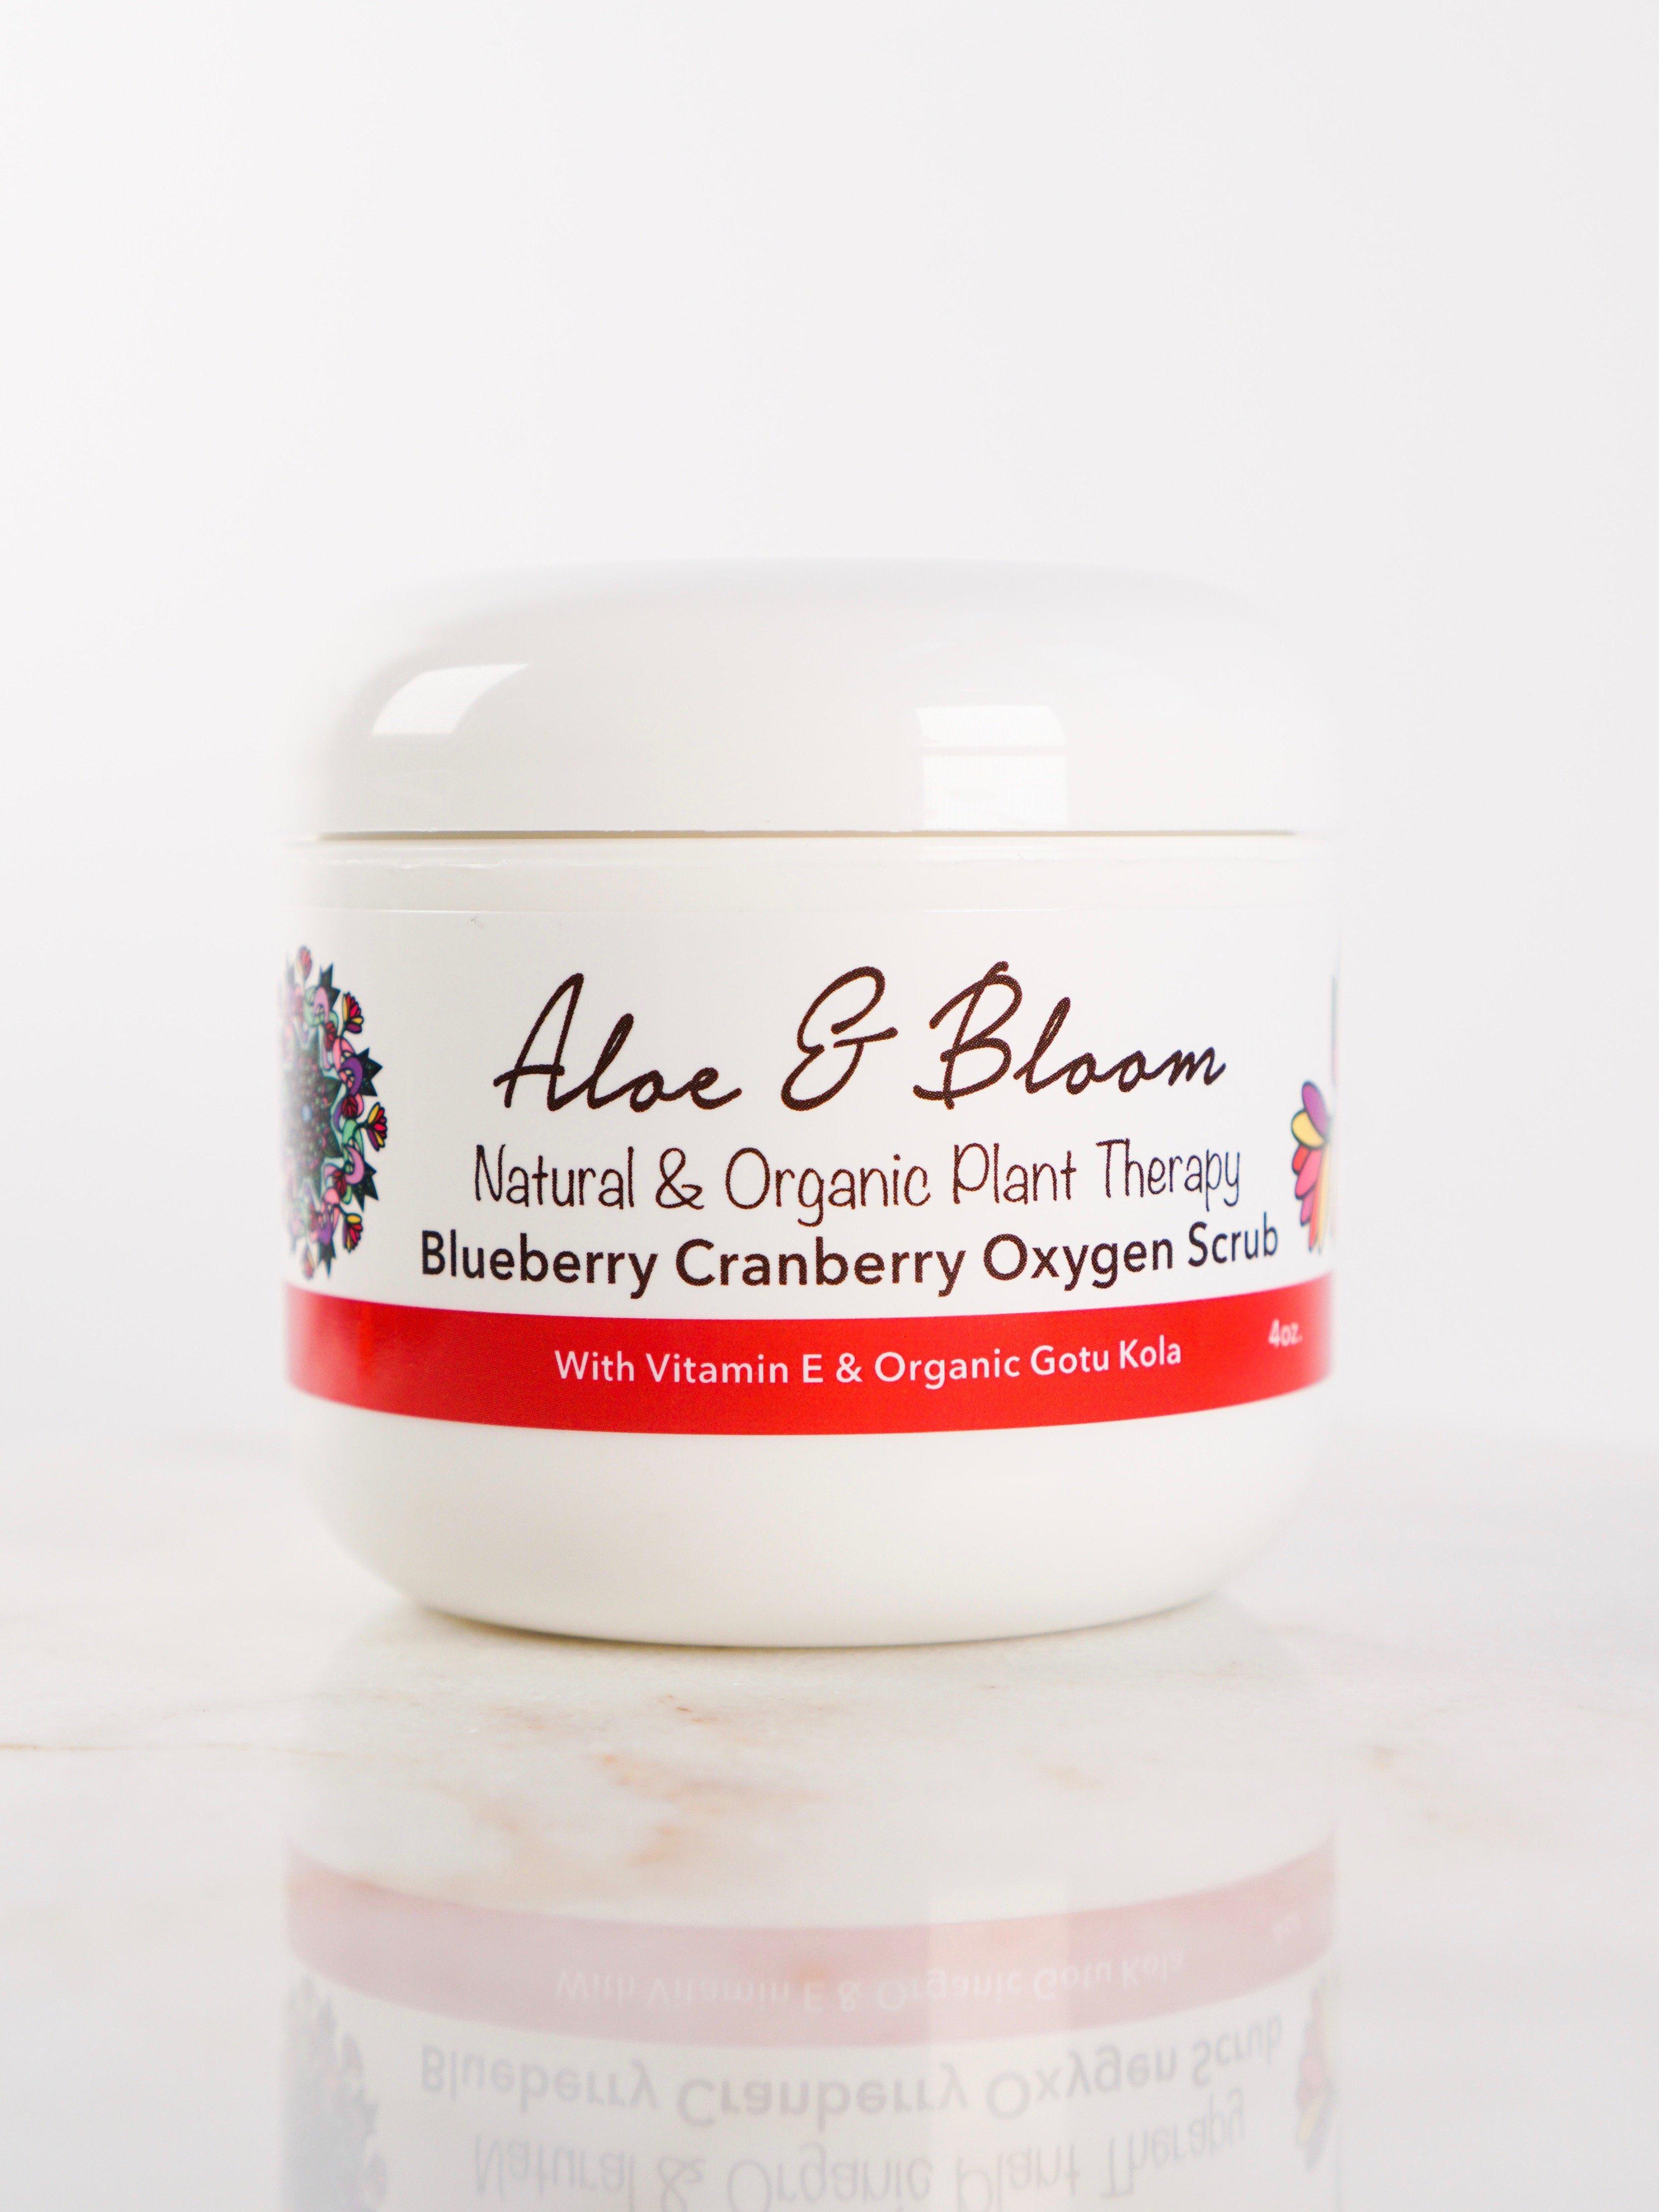 Image of Aloe & Bloom Blueberry Cranberry Oxygen Scrub